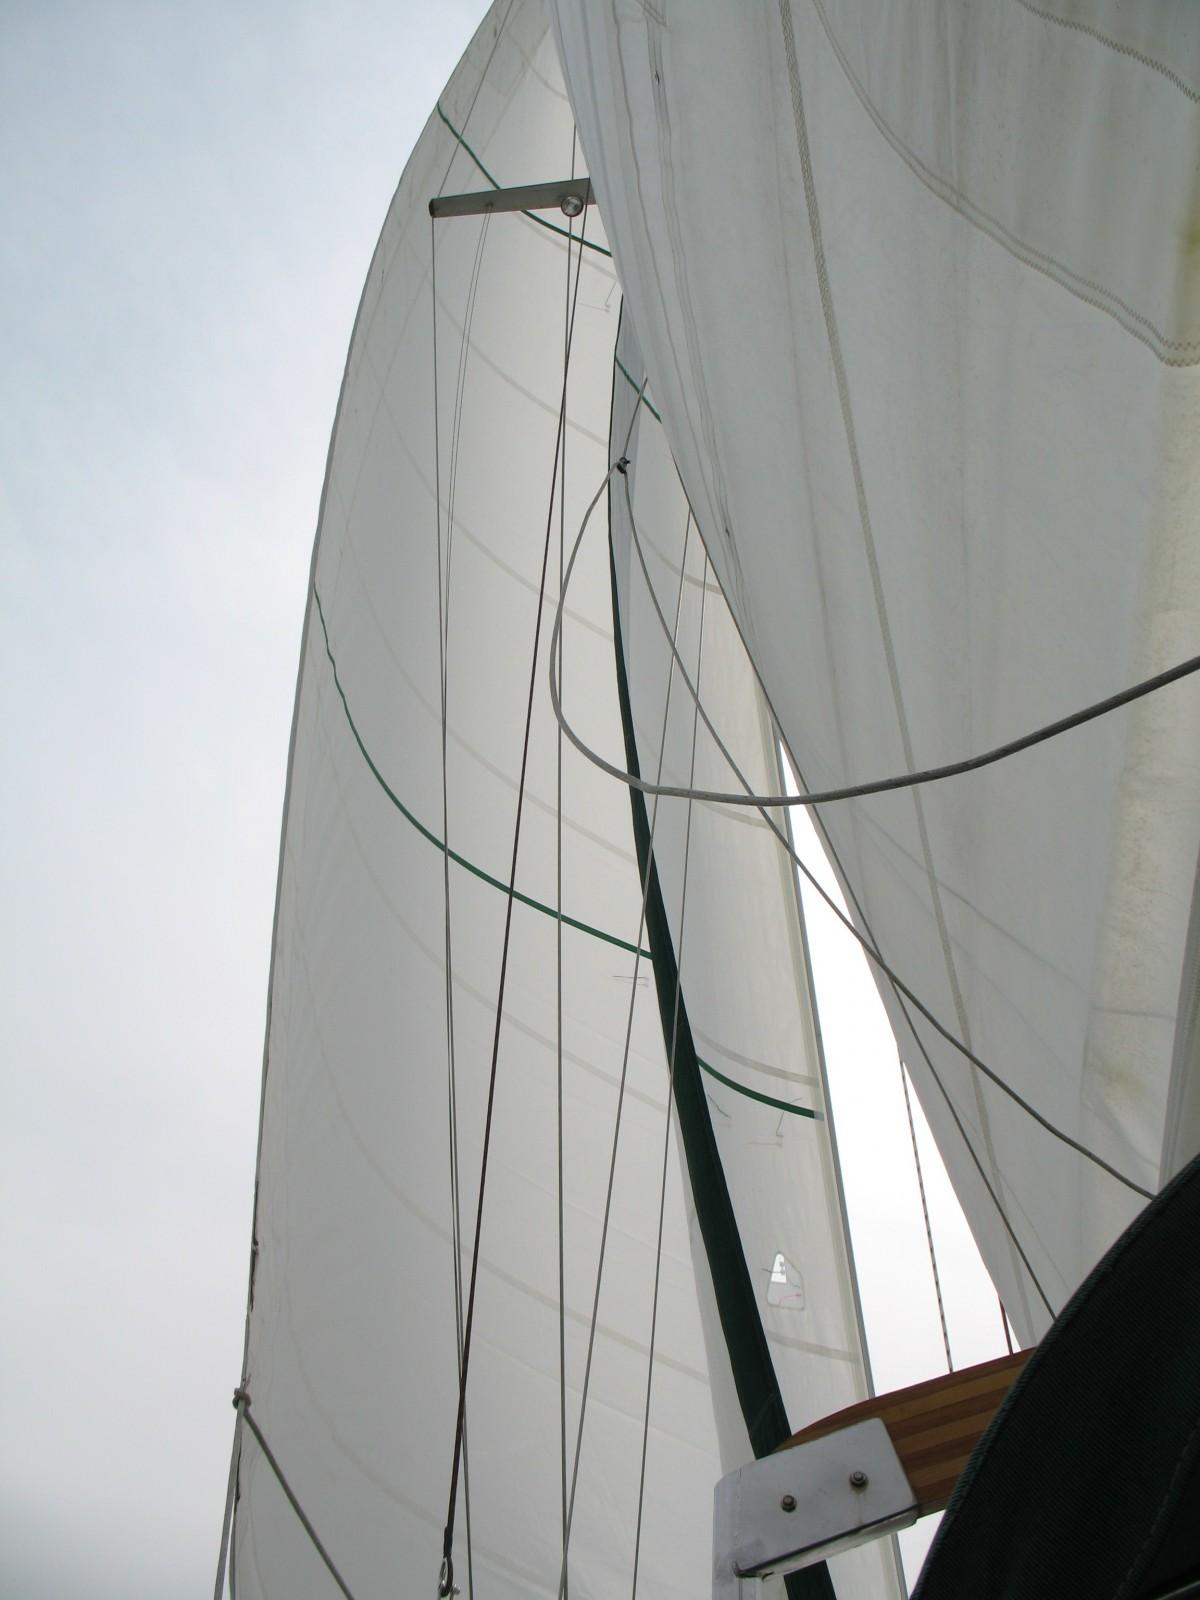 images gratuites mer navire transport v hicule m t yacht port voilier nautique ancre. Black Bedroom Furniture Sets. Home Design Ideas